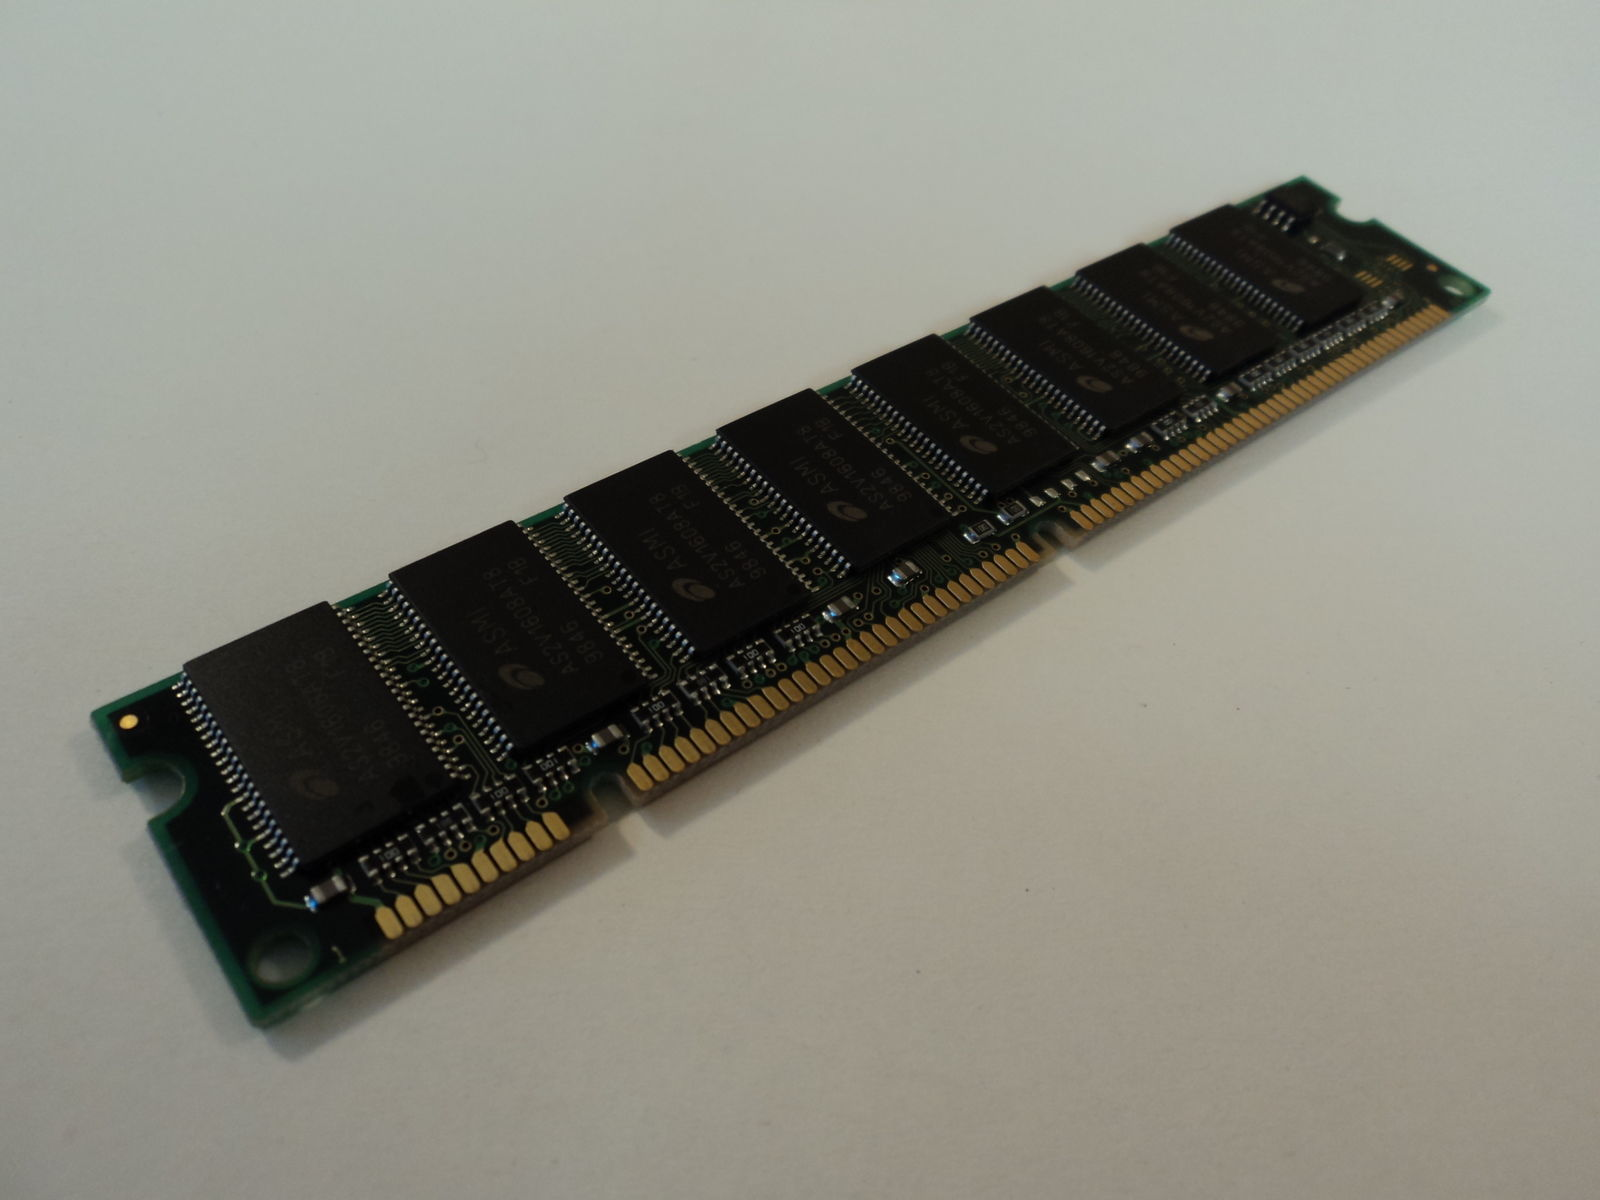 ASMI RAM Memory Stick 16MB AS2V1608AT8 98245 F1B B6483B